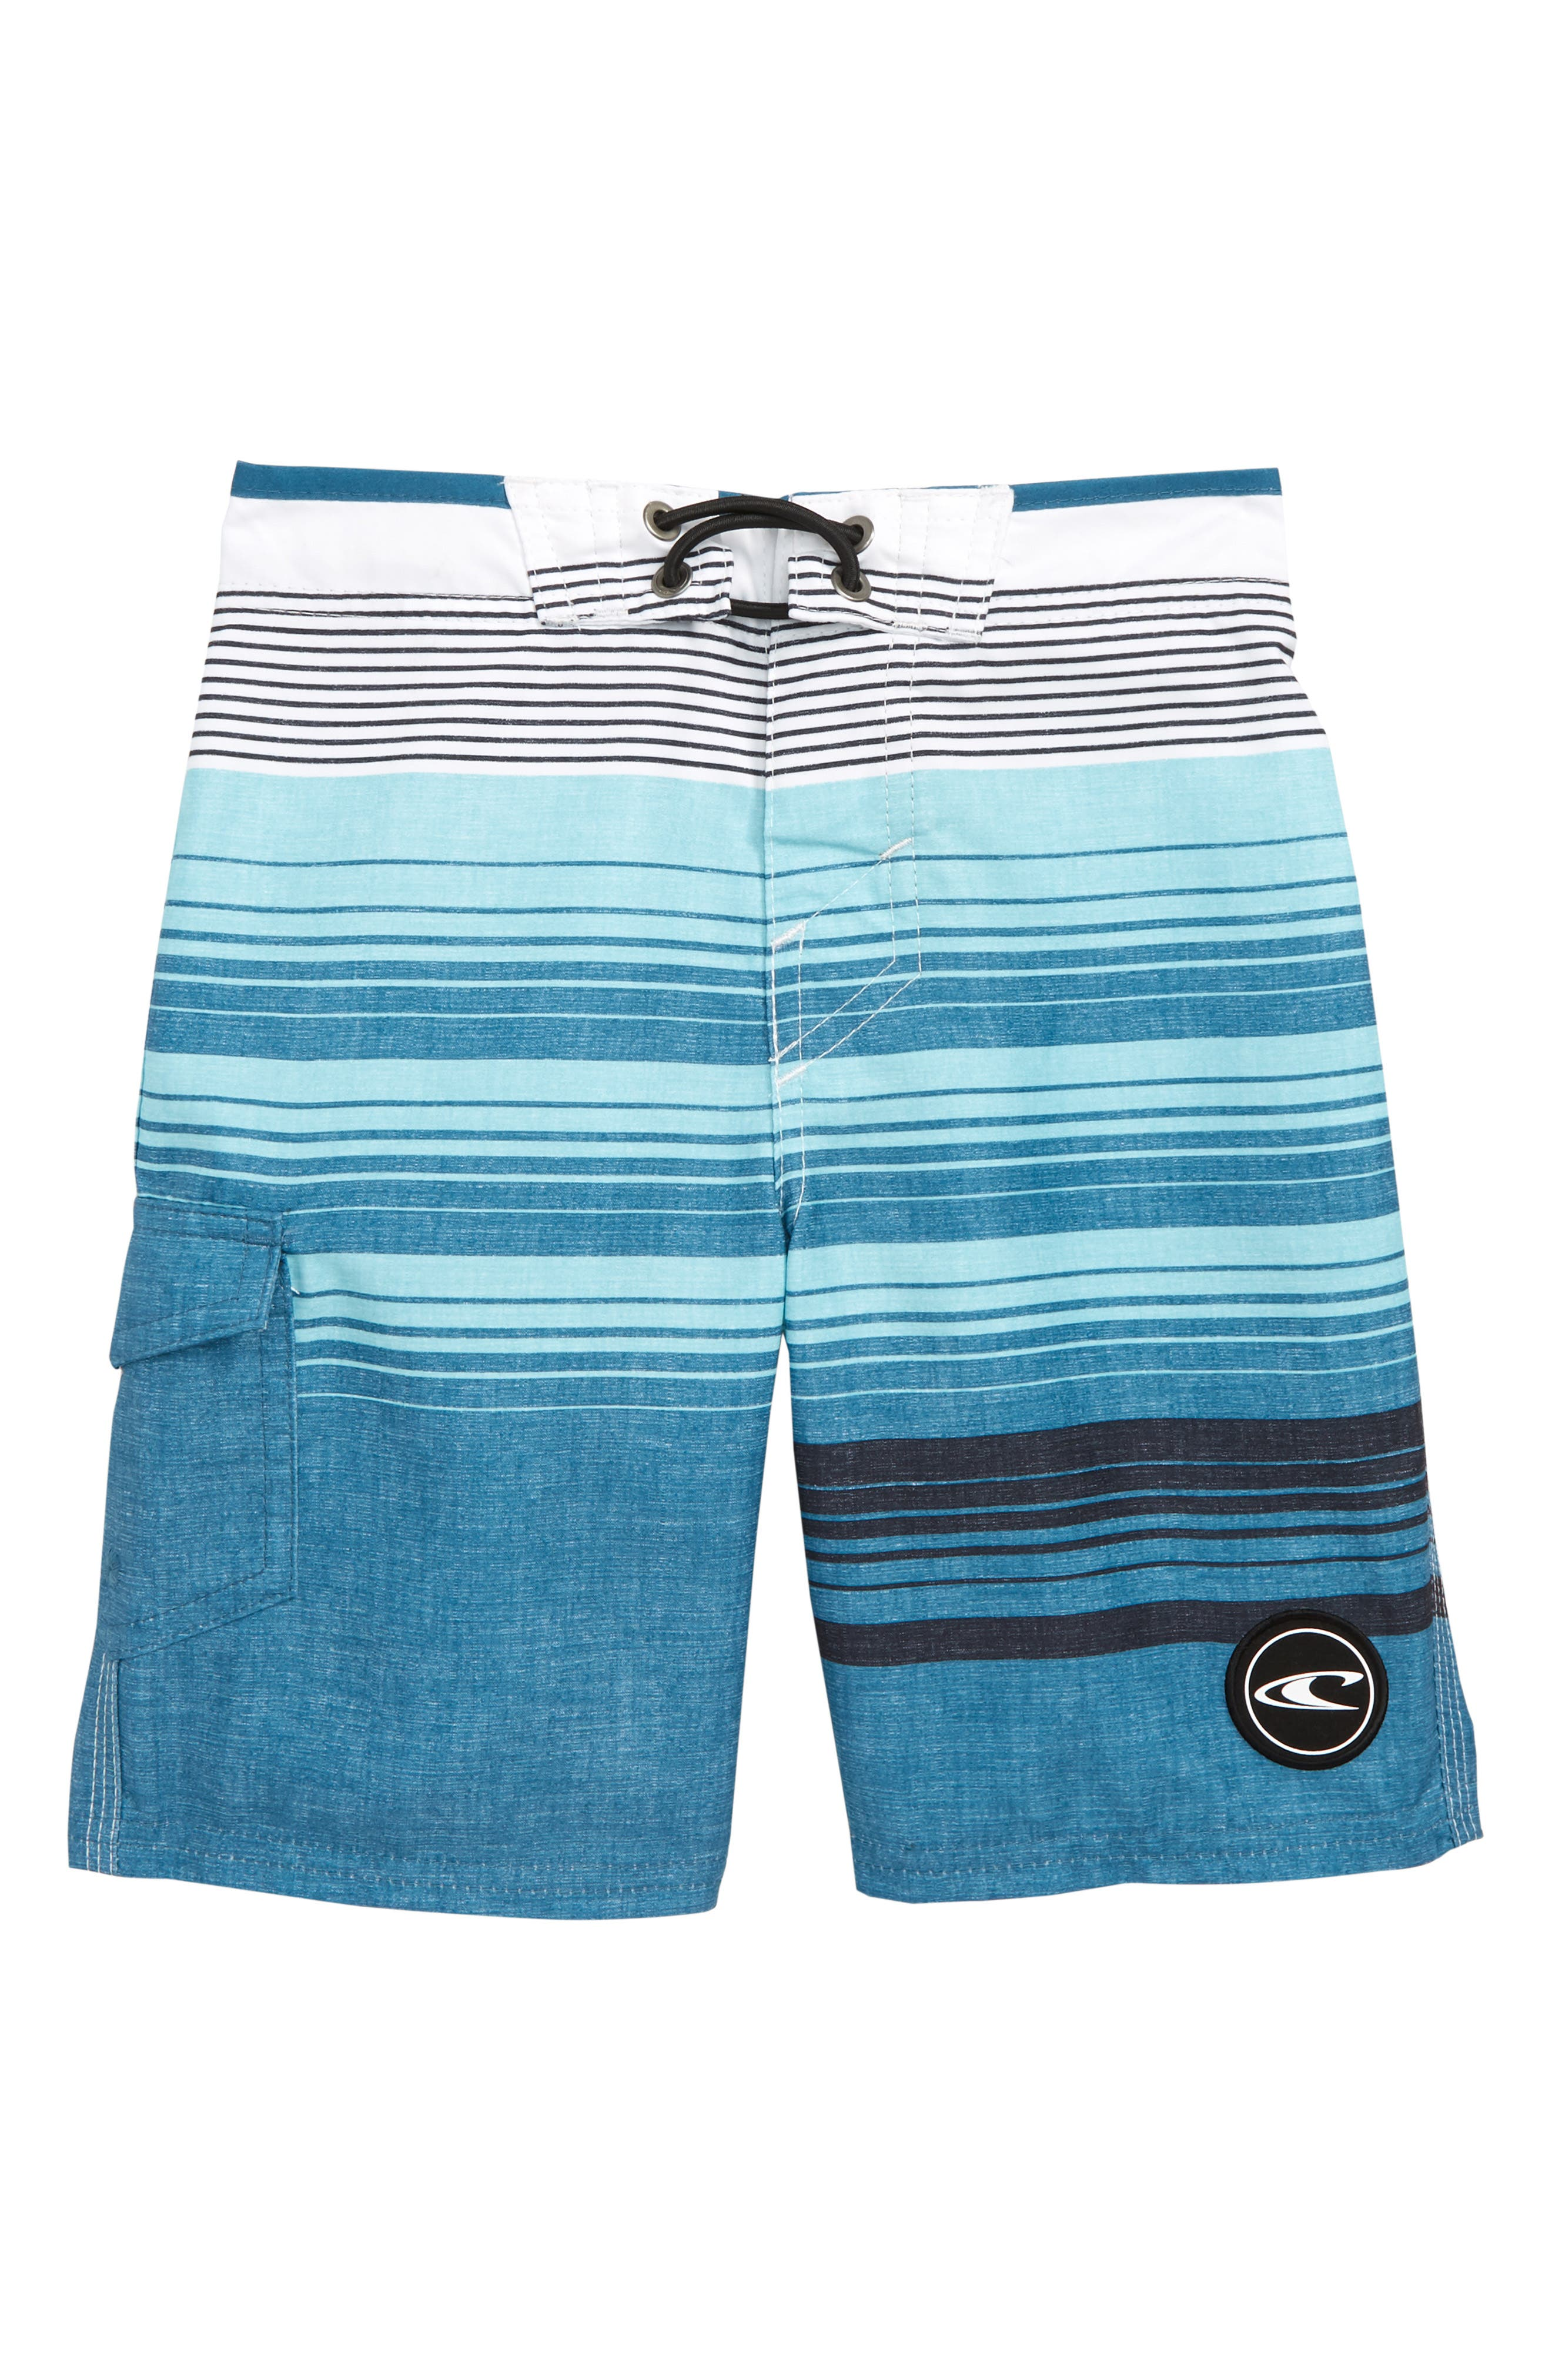 Bennett Board Shorts,                             Main thumbnail 1, color,                             Aqua